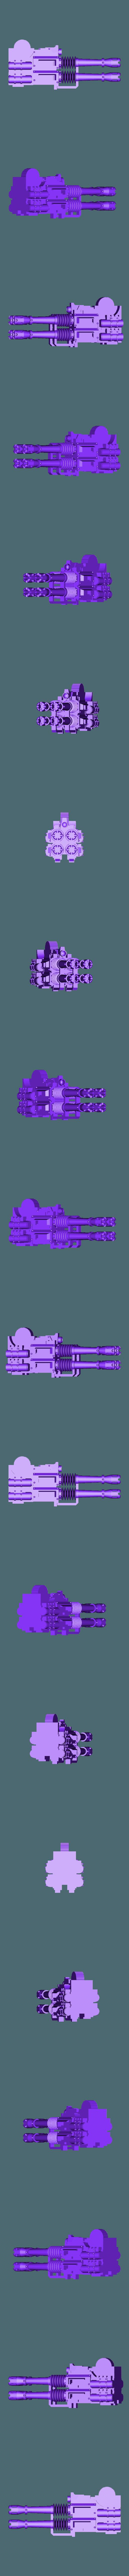 Leviathan_dreadnought_fut_autocanon_v2.STL Download free STL file Gros robot des anciens marin de l'espace • Template to 3D print, ologhzul